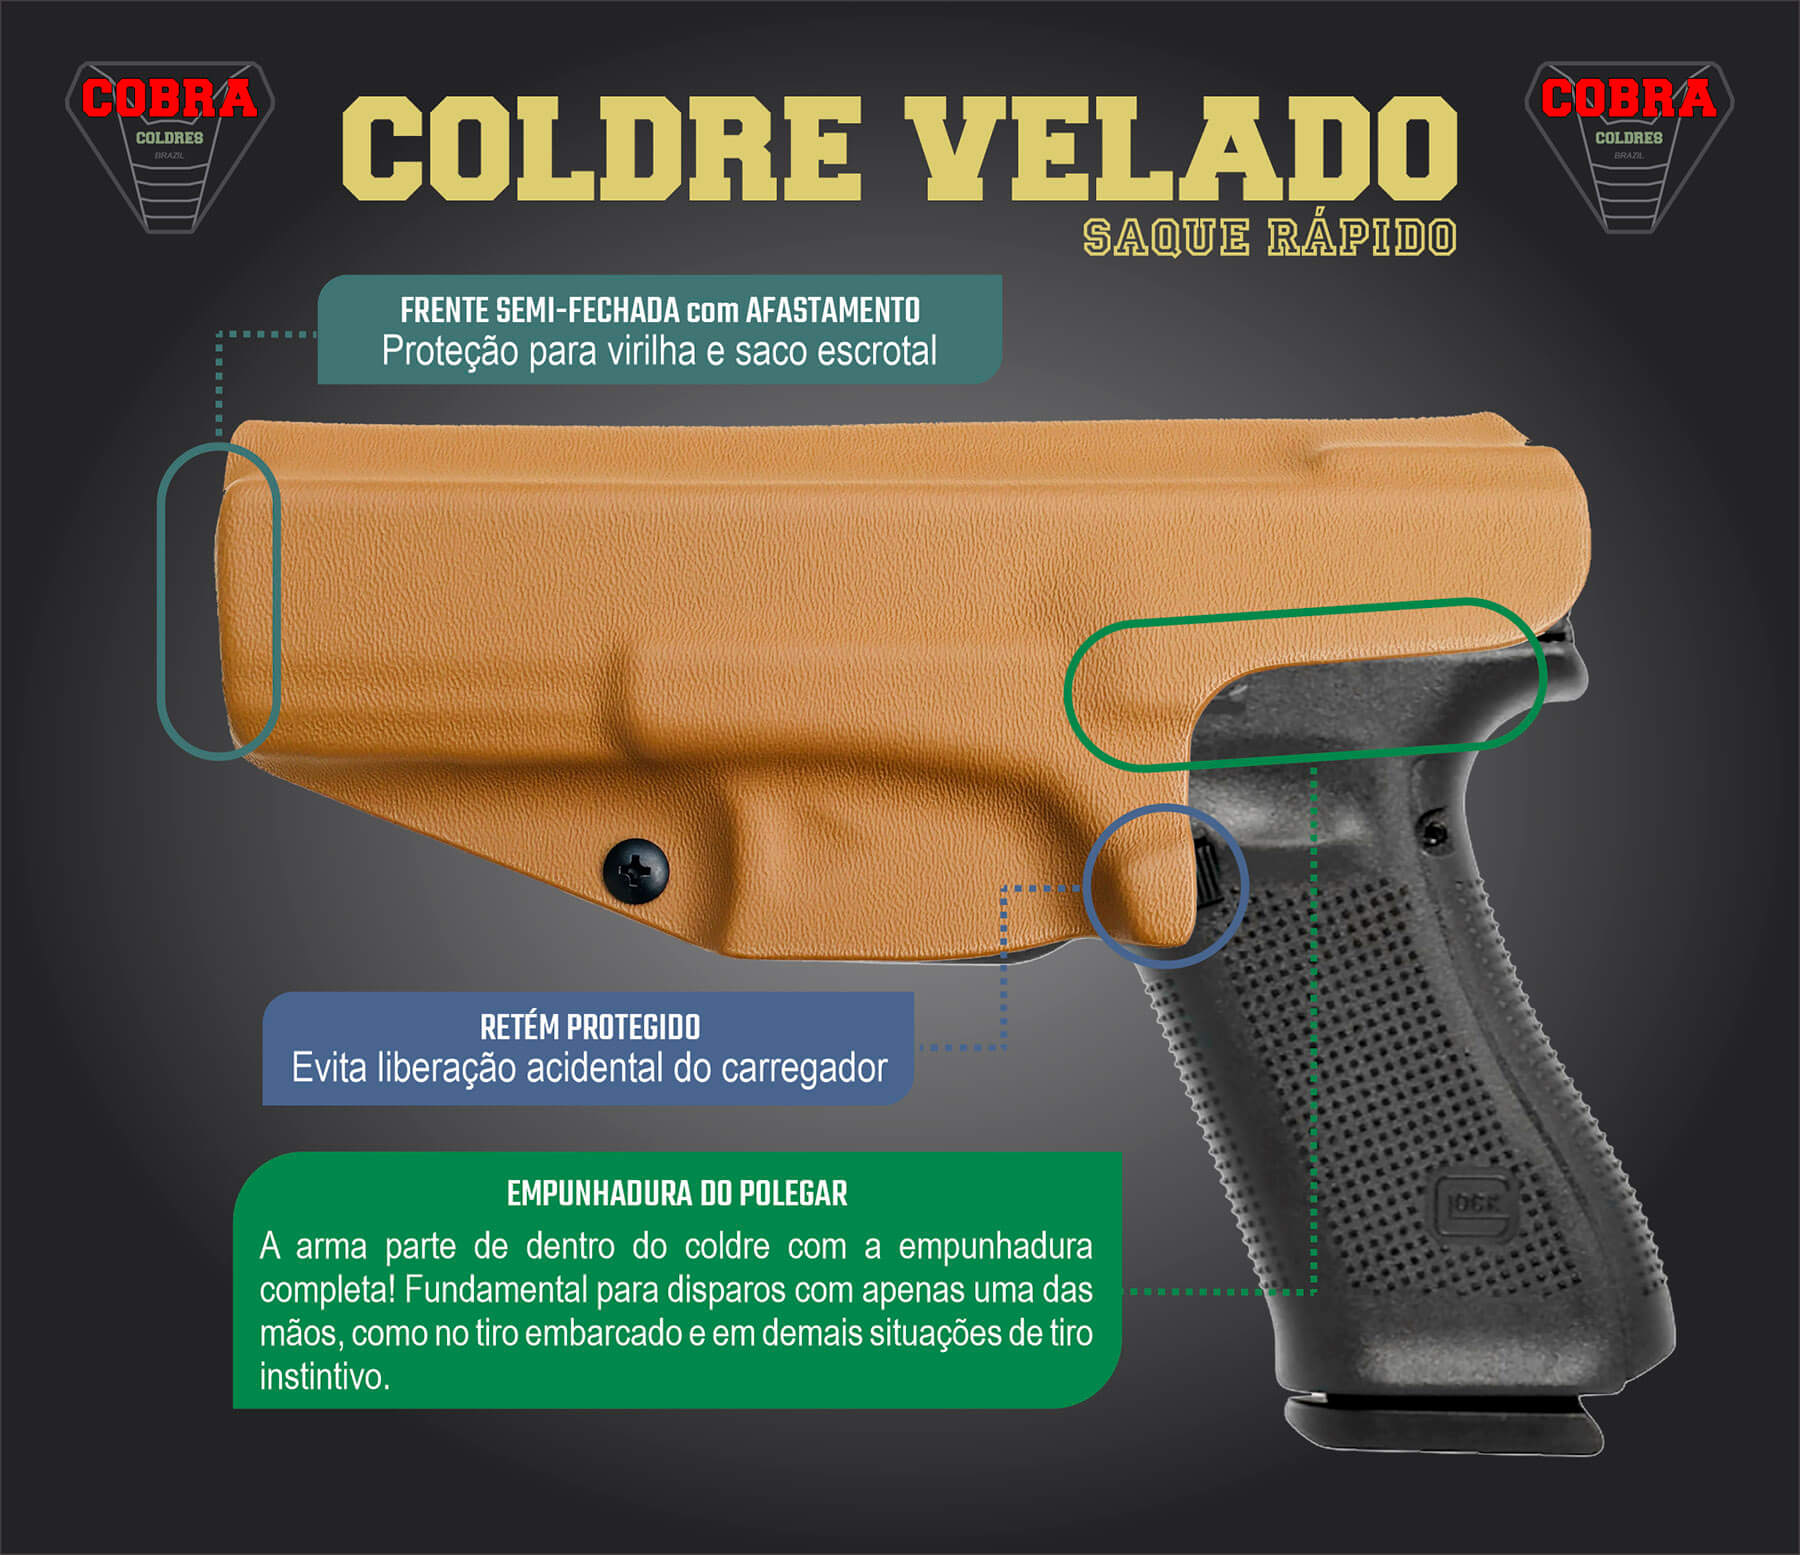 Coldre [Beretta] [APX] 9mm [Full Size] Kydex + 2 Porta-Carregadores Universais - Saque Rápido Velado Kydex® 080